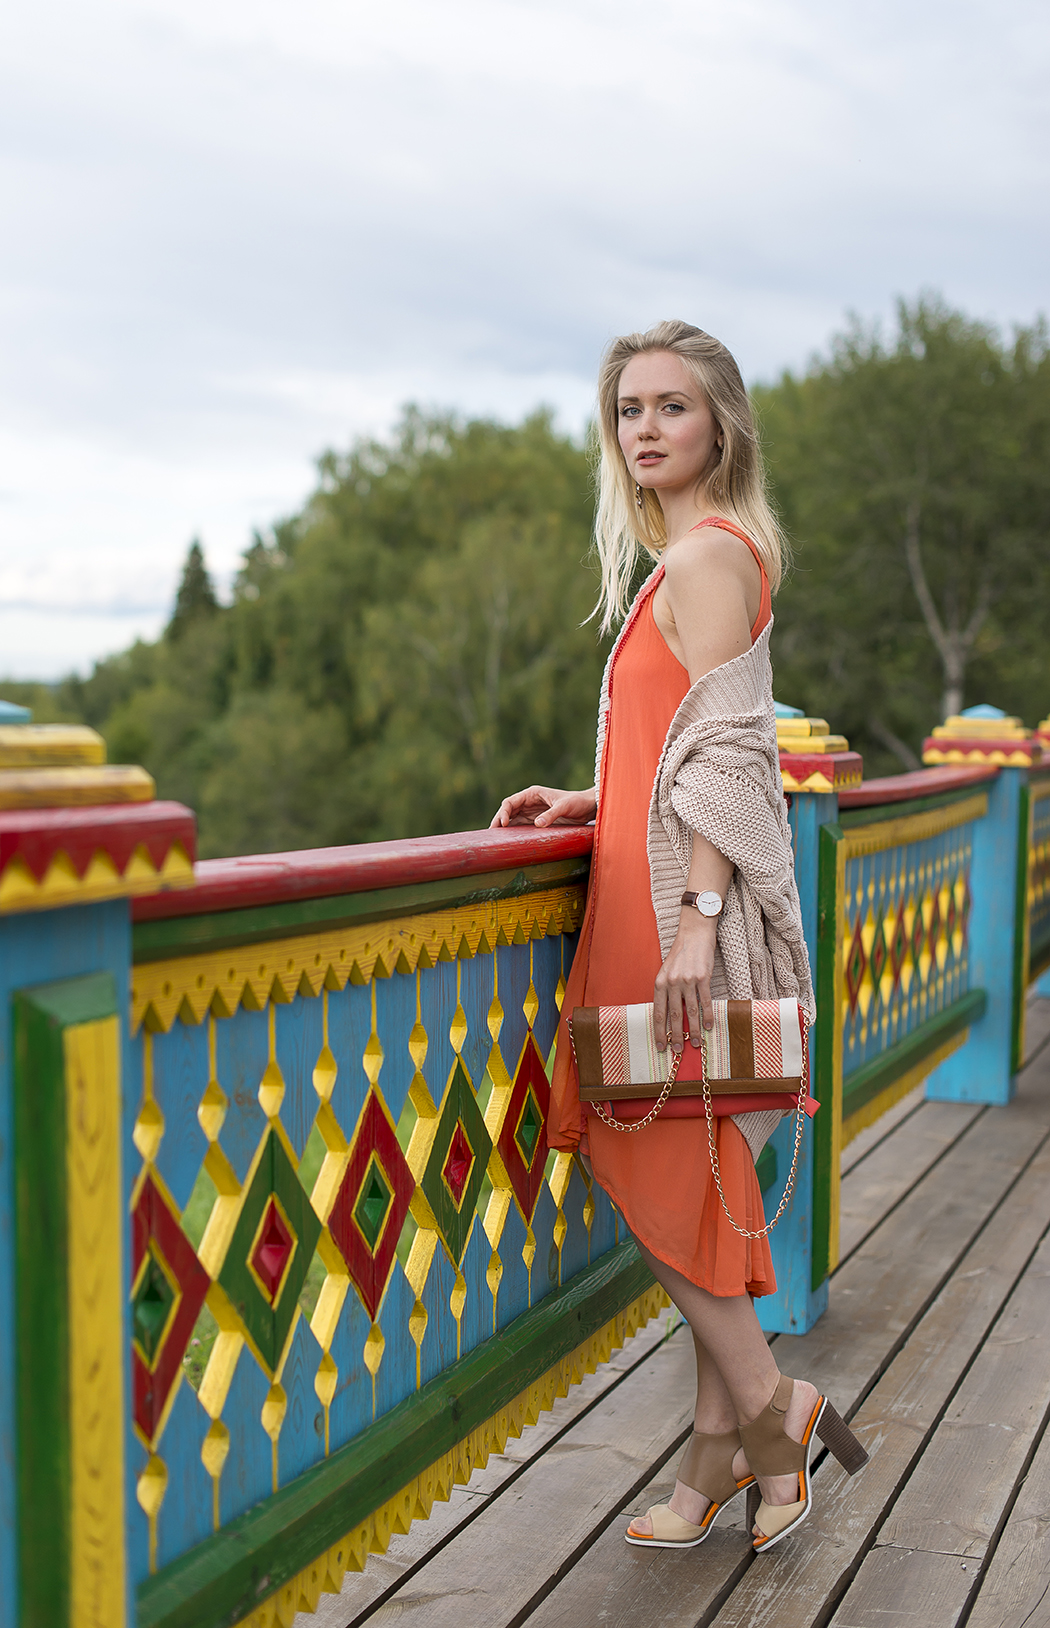 inspiration, streetstyle, summer outfit, summer streetstyle, autumn outfit, knitted sweater, oversize sweater, annamidday, top fashion blogger, top russian fashion blogger, фэшн блогер, русский блогер, известный блогер, топовый блогер, russian bloger, top russian blogger, top russian bloggers, streetfashion, russian fashion blogger, blogger, fashion, style, fashionista, модный блогер, российский блогер, ТОП блогер, ootd, lookoftheday, look, популярный блогер, российский модный блогер, annamidday, top russian blogger, summer look,  russian girl, с чем носить кардиган, бежевый кардиган, вязаный кардиган, плес, иваново, ples, pleos, volga, volga river, волга,  girly, beige cardigan, how to wear sweater, zara, river island, aldo, aldo shoes, sheinside, красивая девушка, русская девушка, fashion week